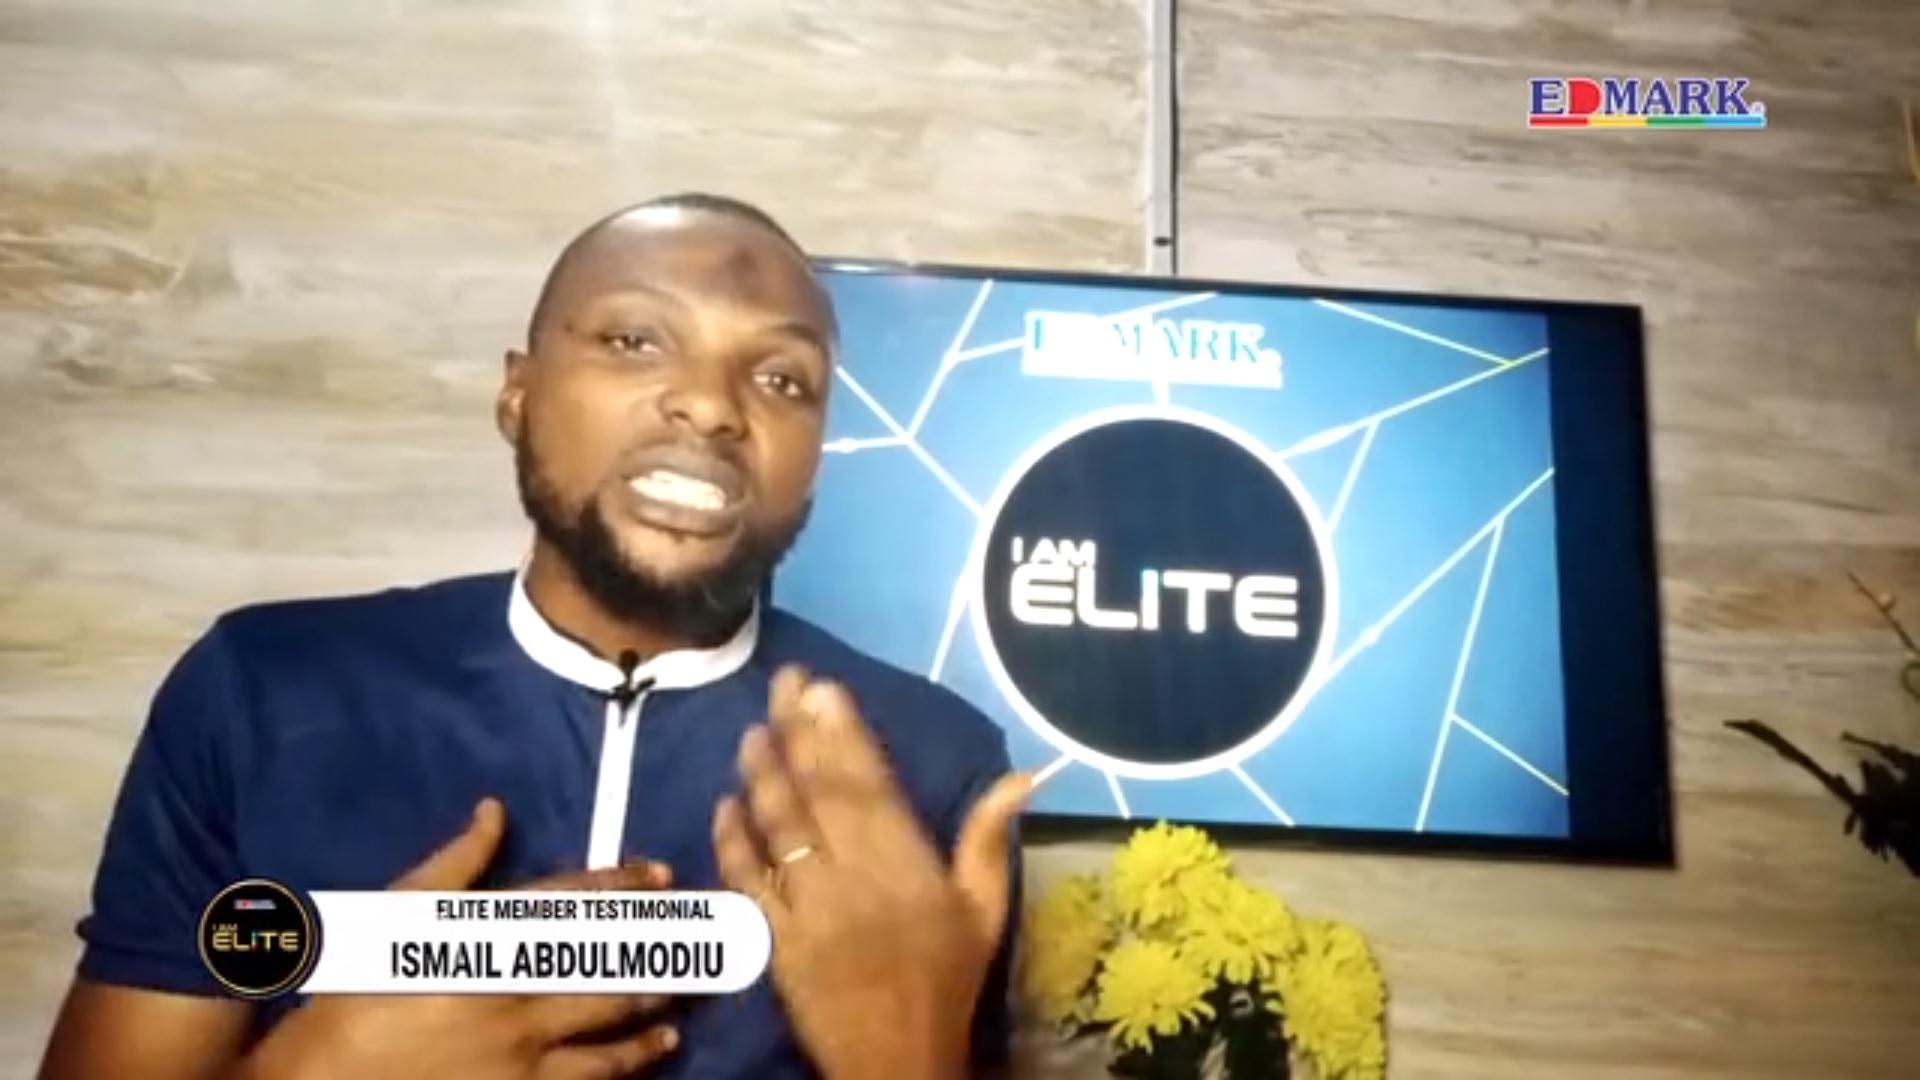 Elite Testimonial – CM Ismail Abdulmodiu